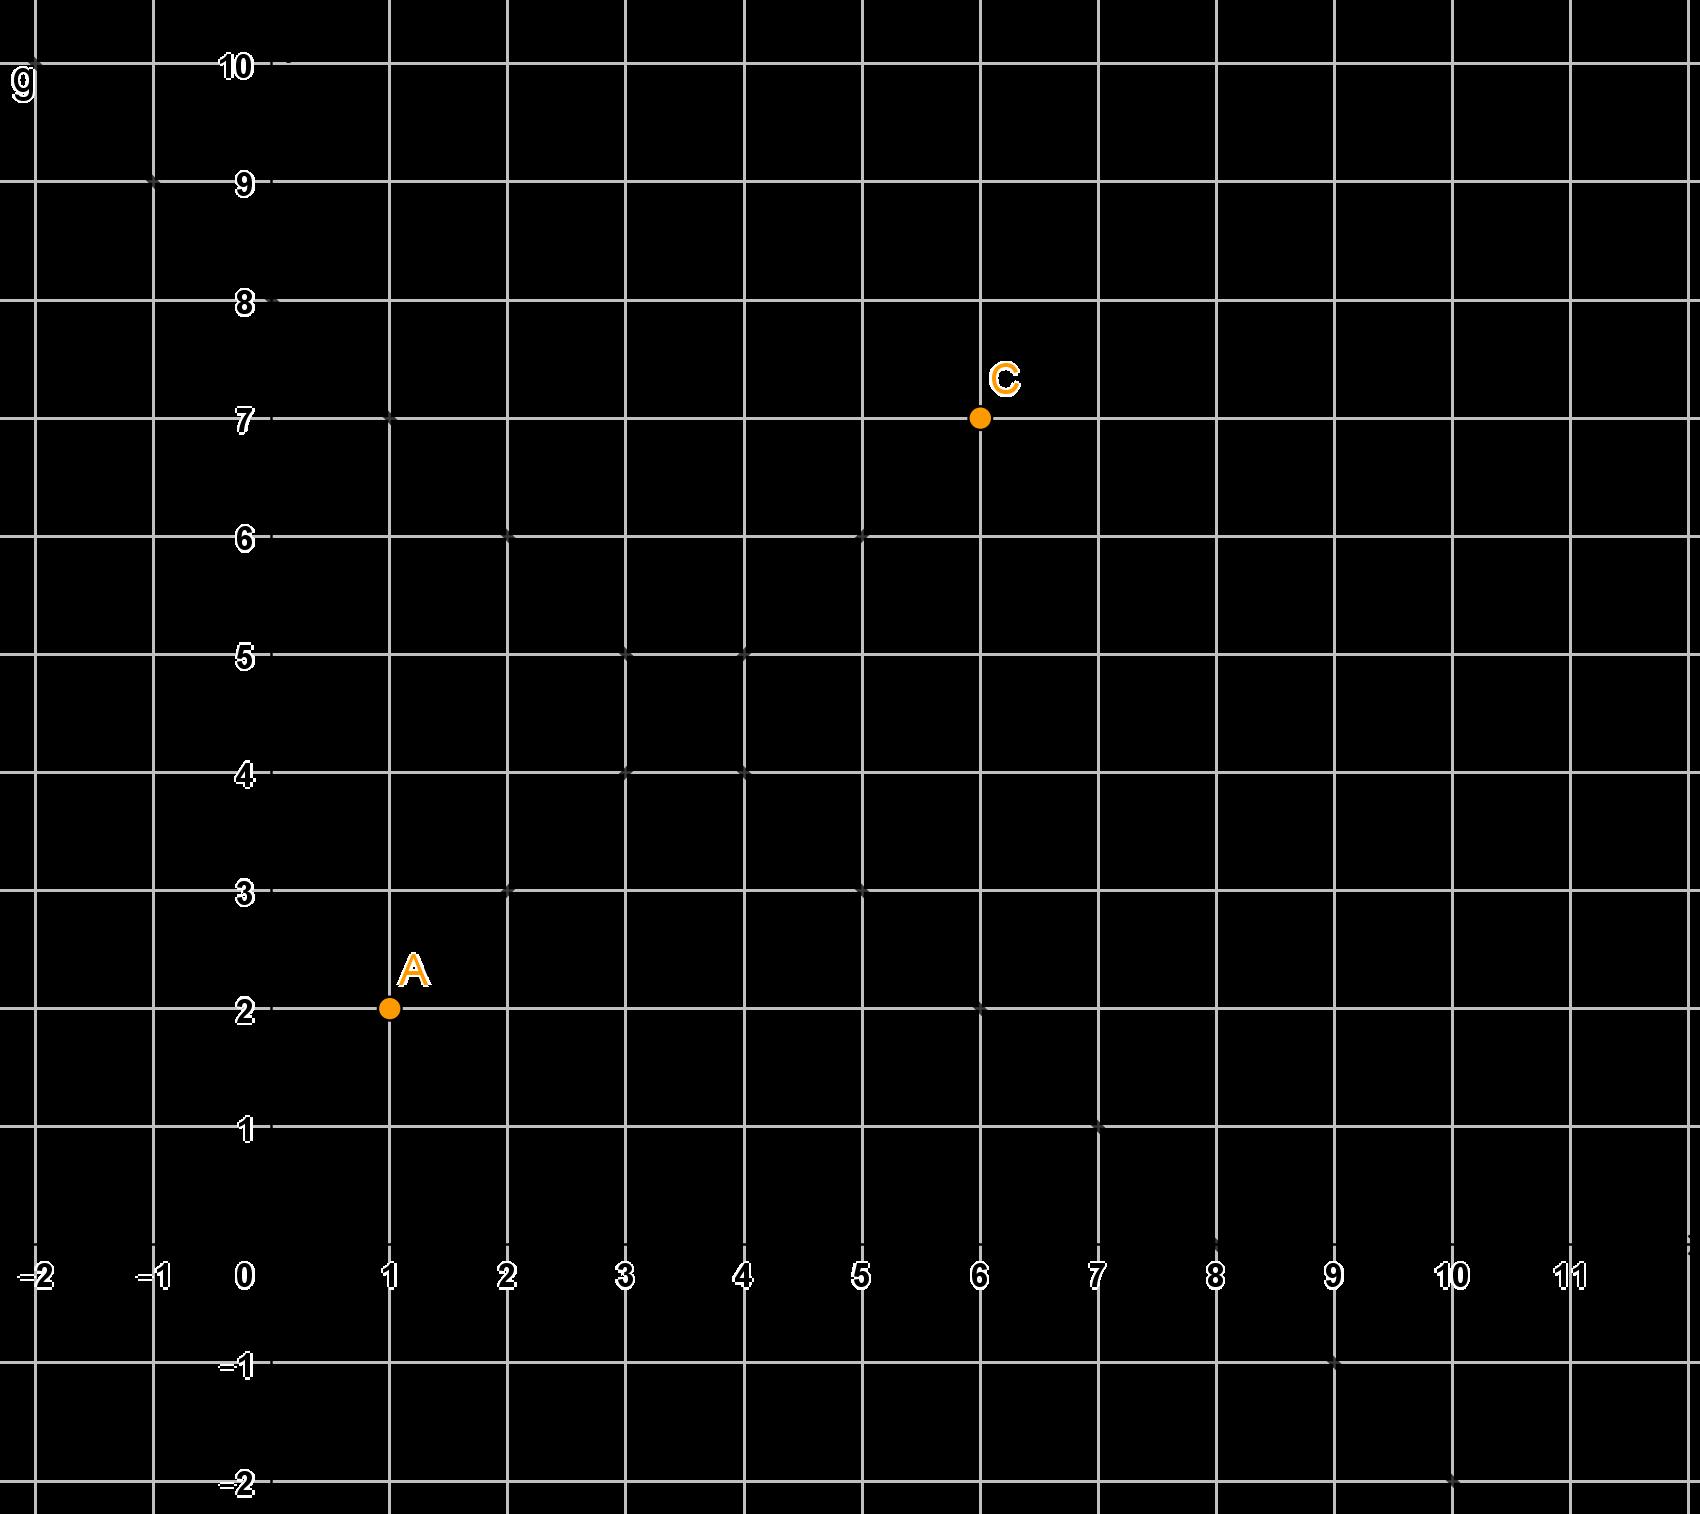 Koordinatensystem mit Mittelsenkrechte